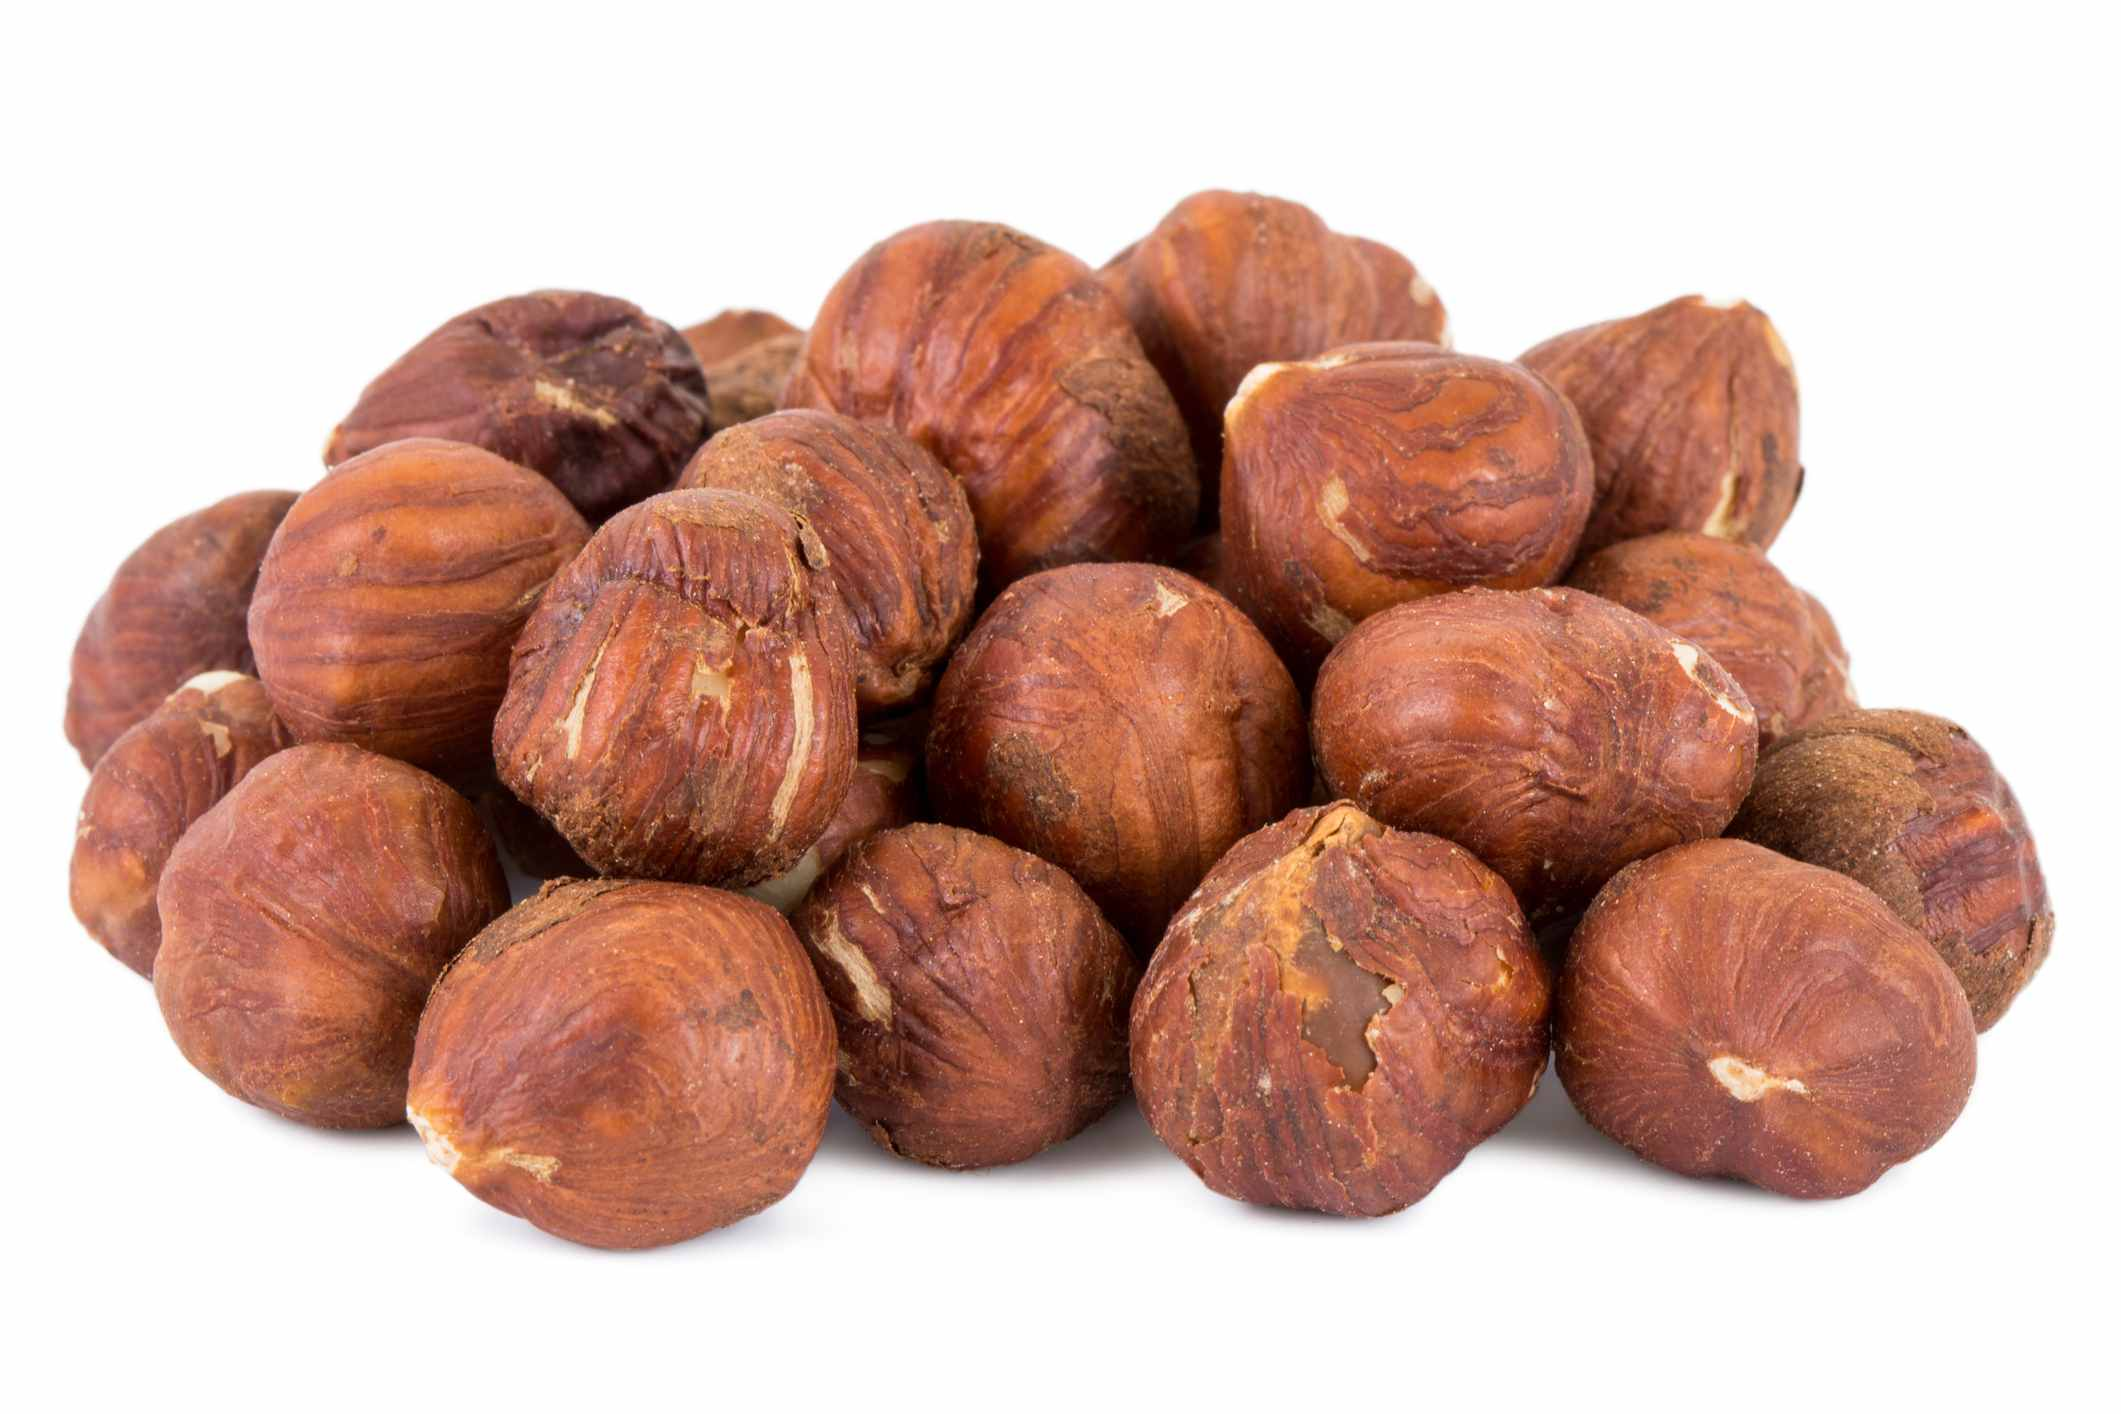 Closeup of a heap of hazelnuts